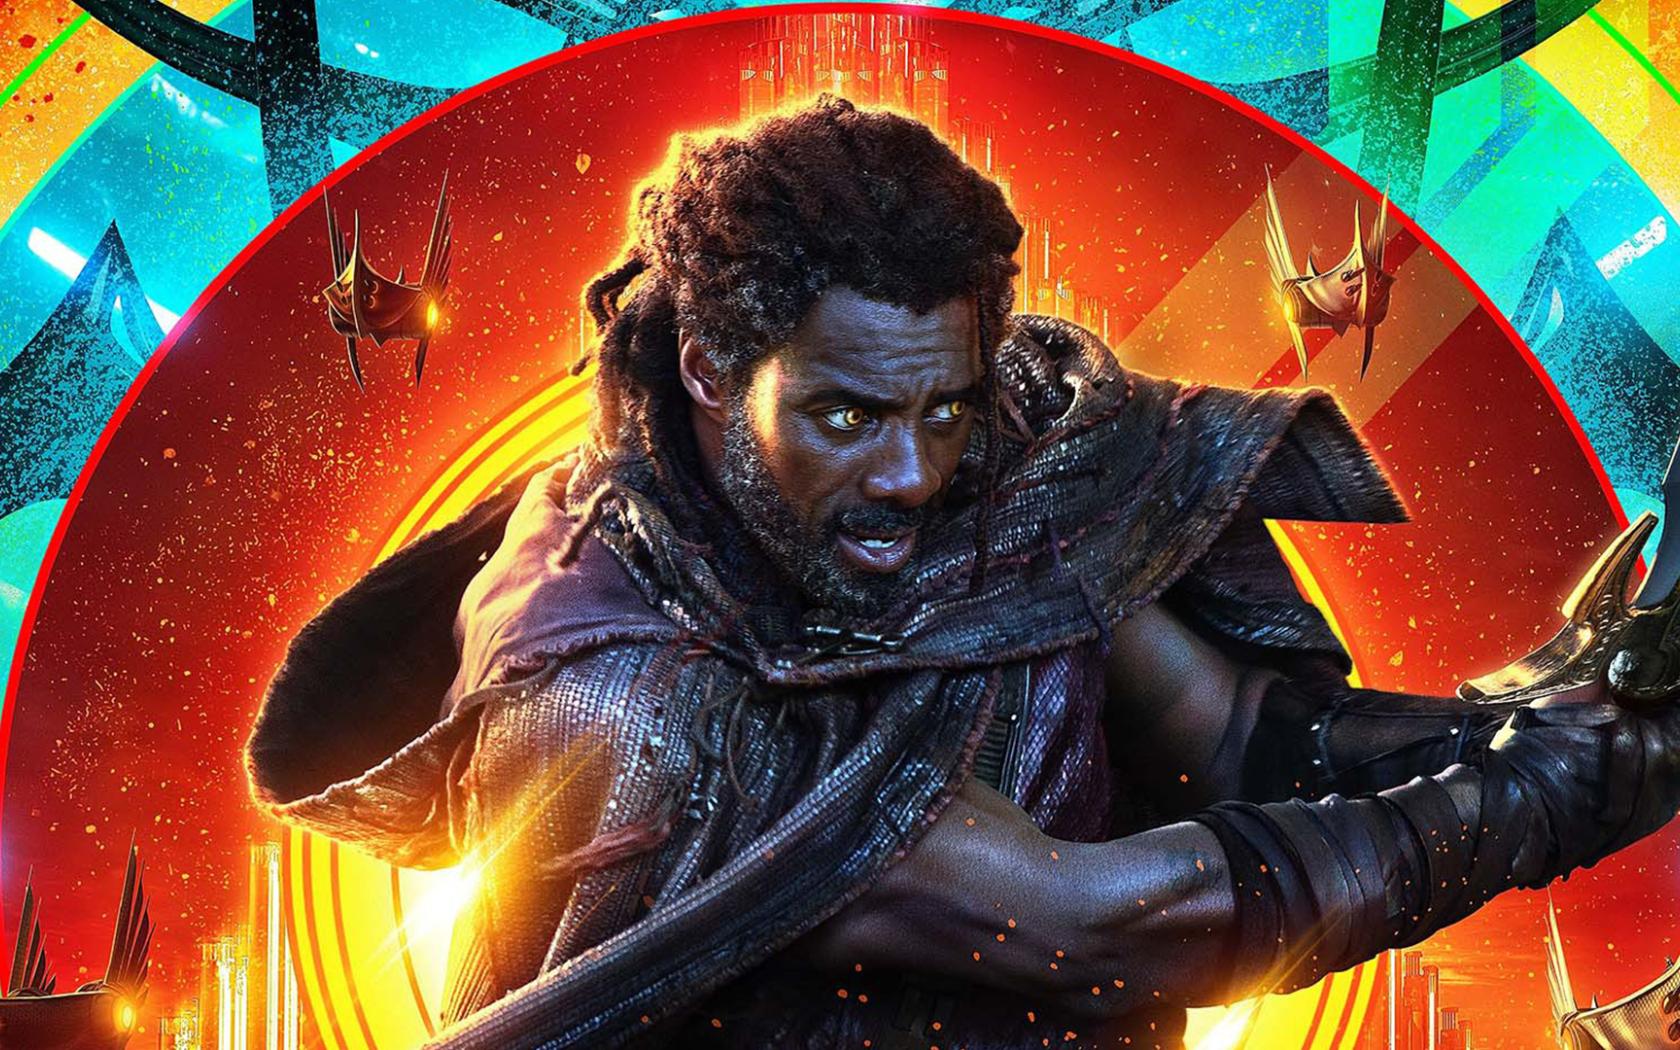 Heimdal Hd Wallpaper: Idris Elba As Heimdall, Full HD Wallpaper